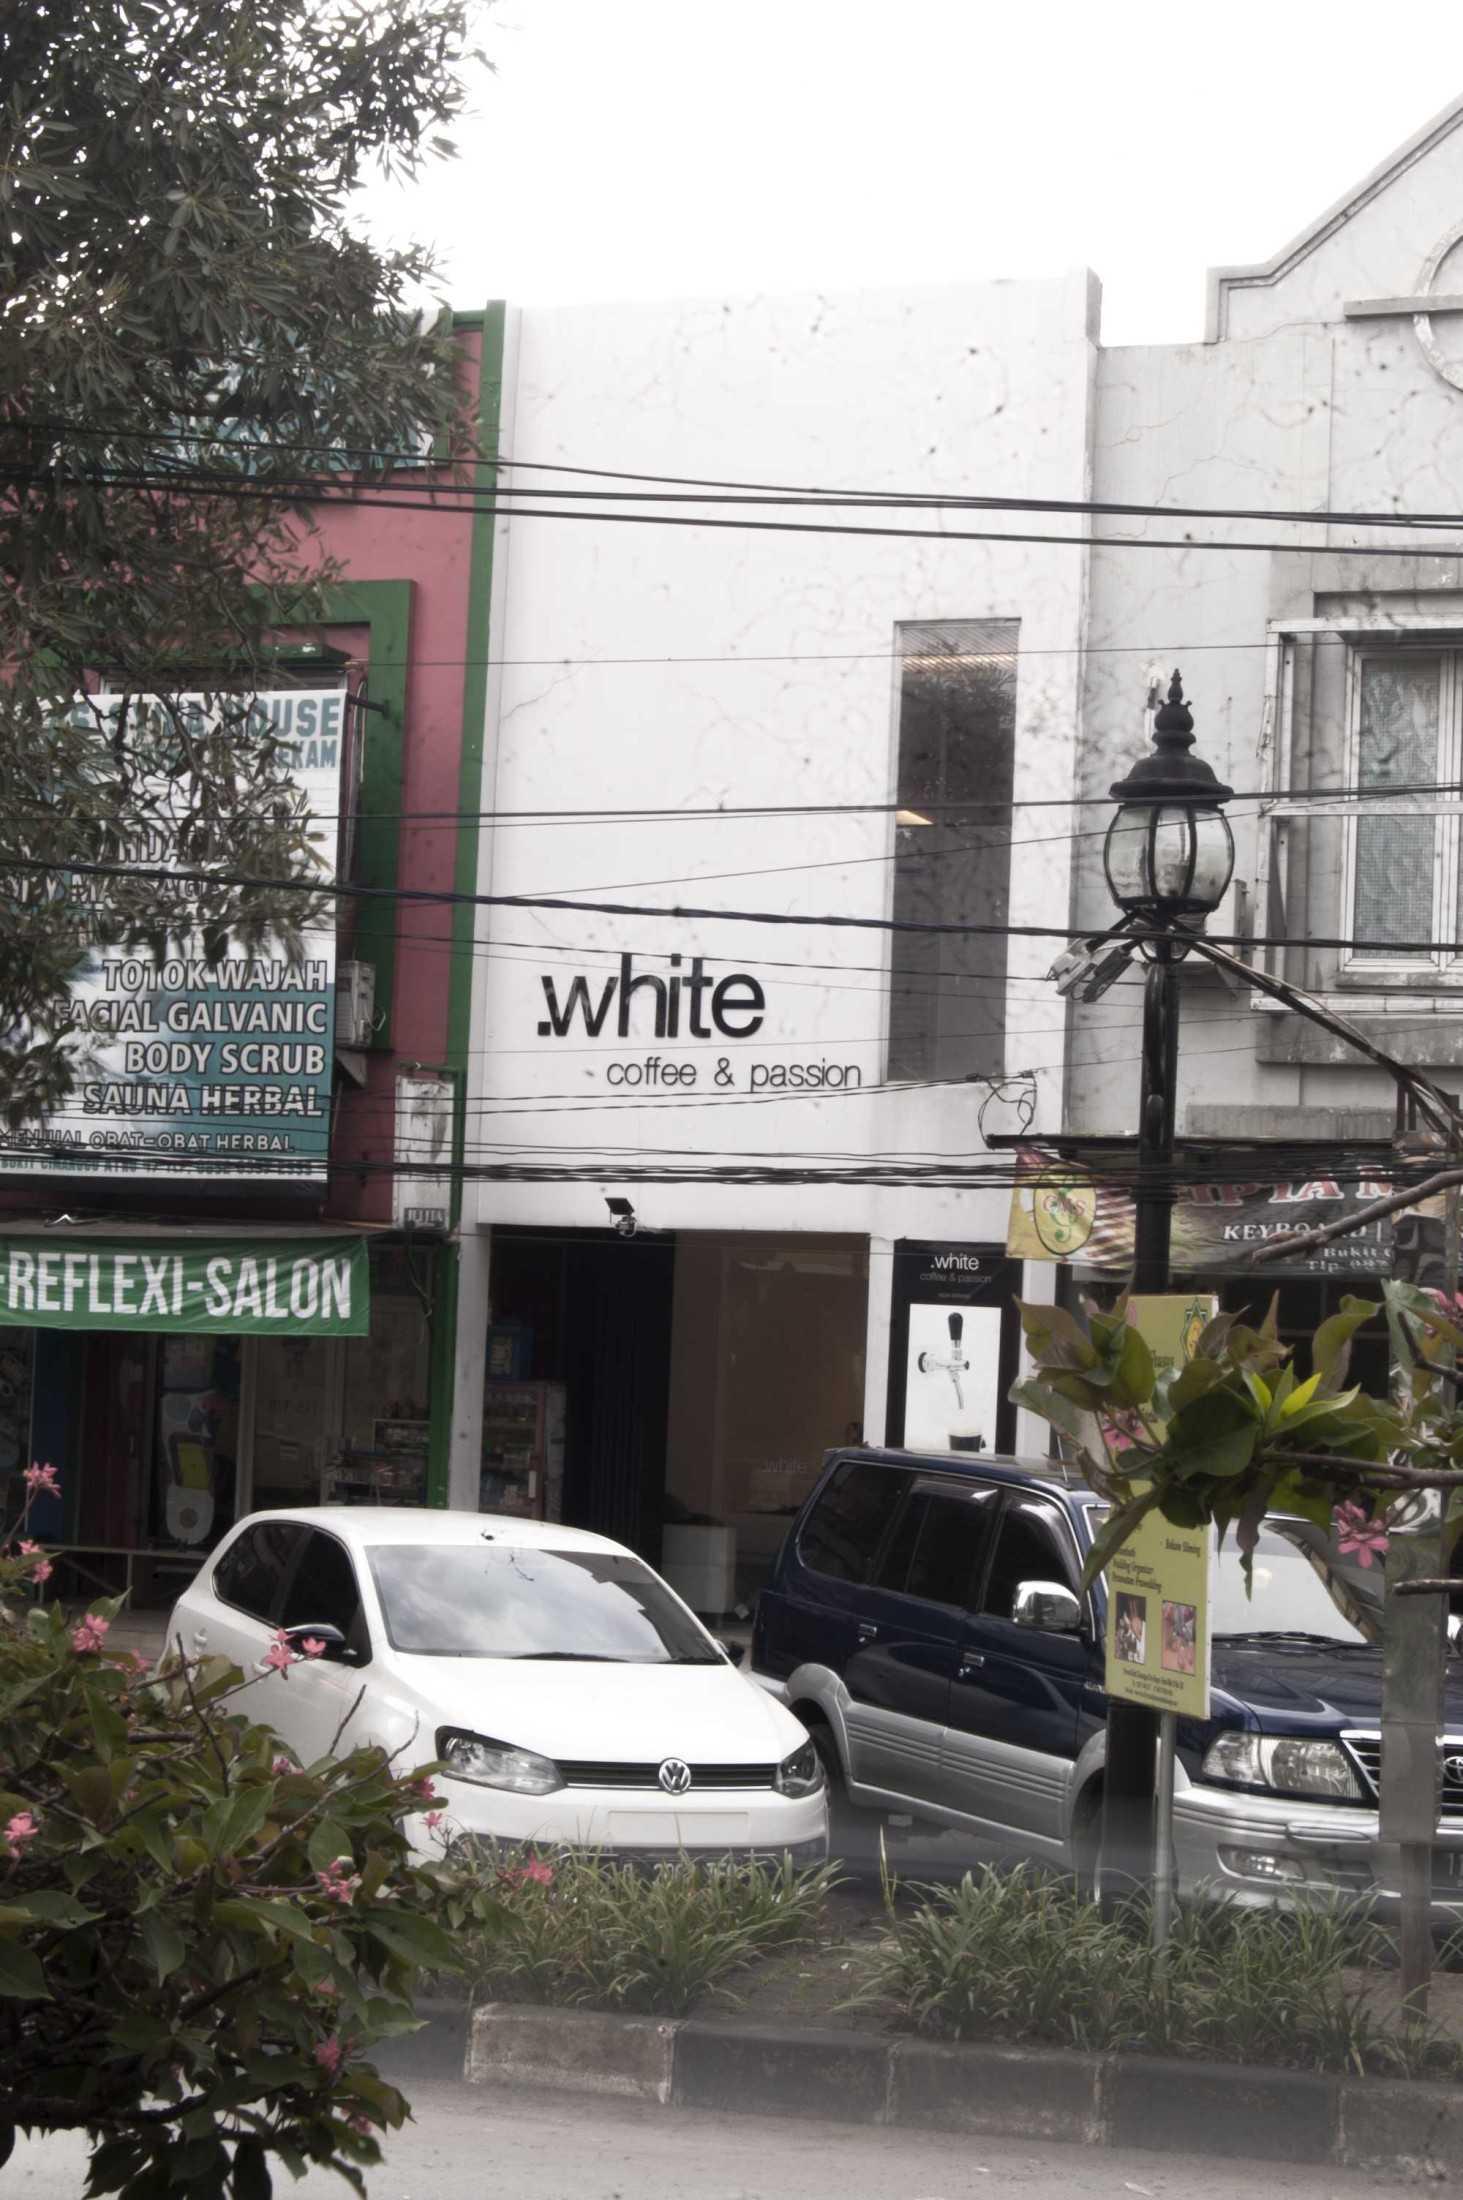 Ads Architect Kafe Kotak Putih Sentul Selatan Sentul Selatan Ads-Architect-Kafe-Kotak-Putih  53516